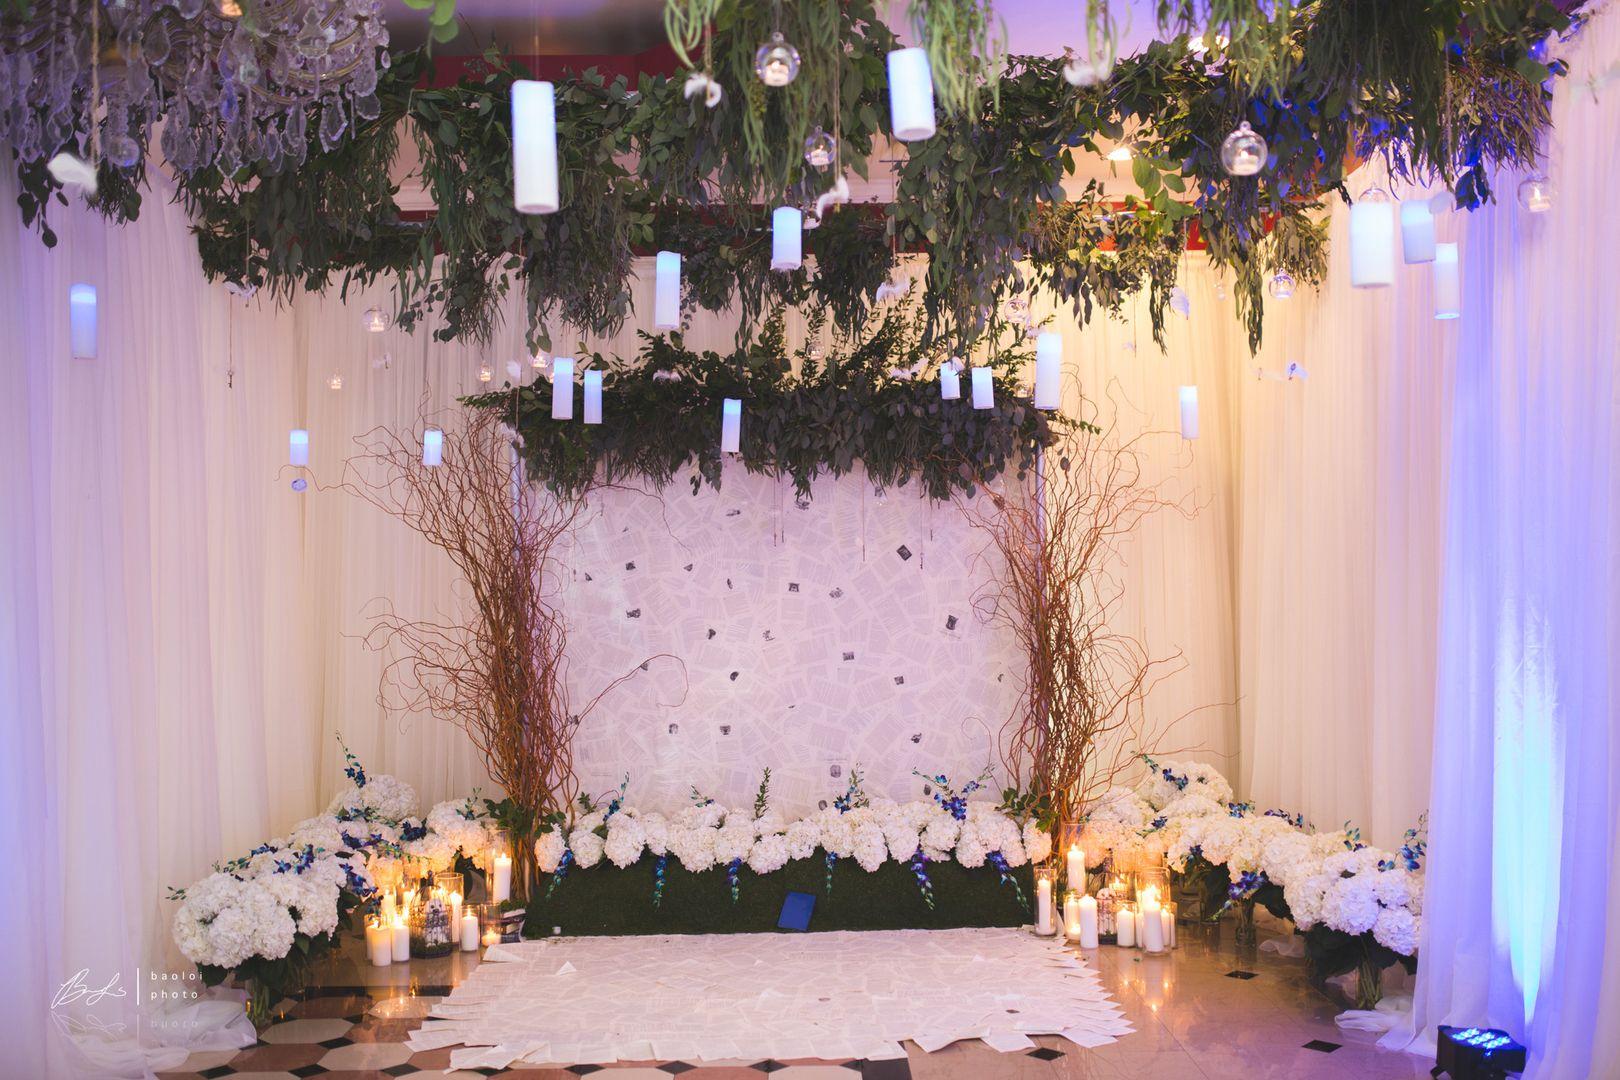 Wedding Decorations Rentals Houston Linen Rental Houston For Event And Wedding Decoration Wedding Rentals Decor Wedding Decorations Cheap Wedding Decorations